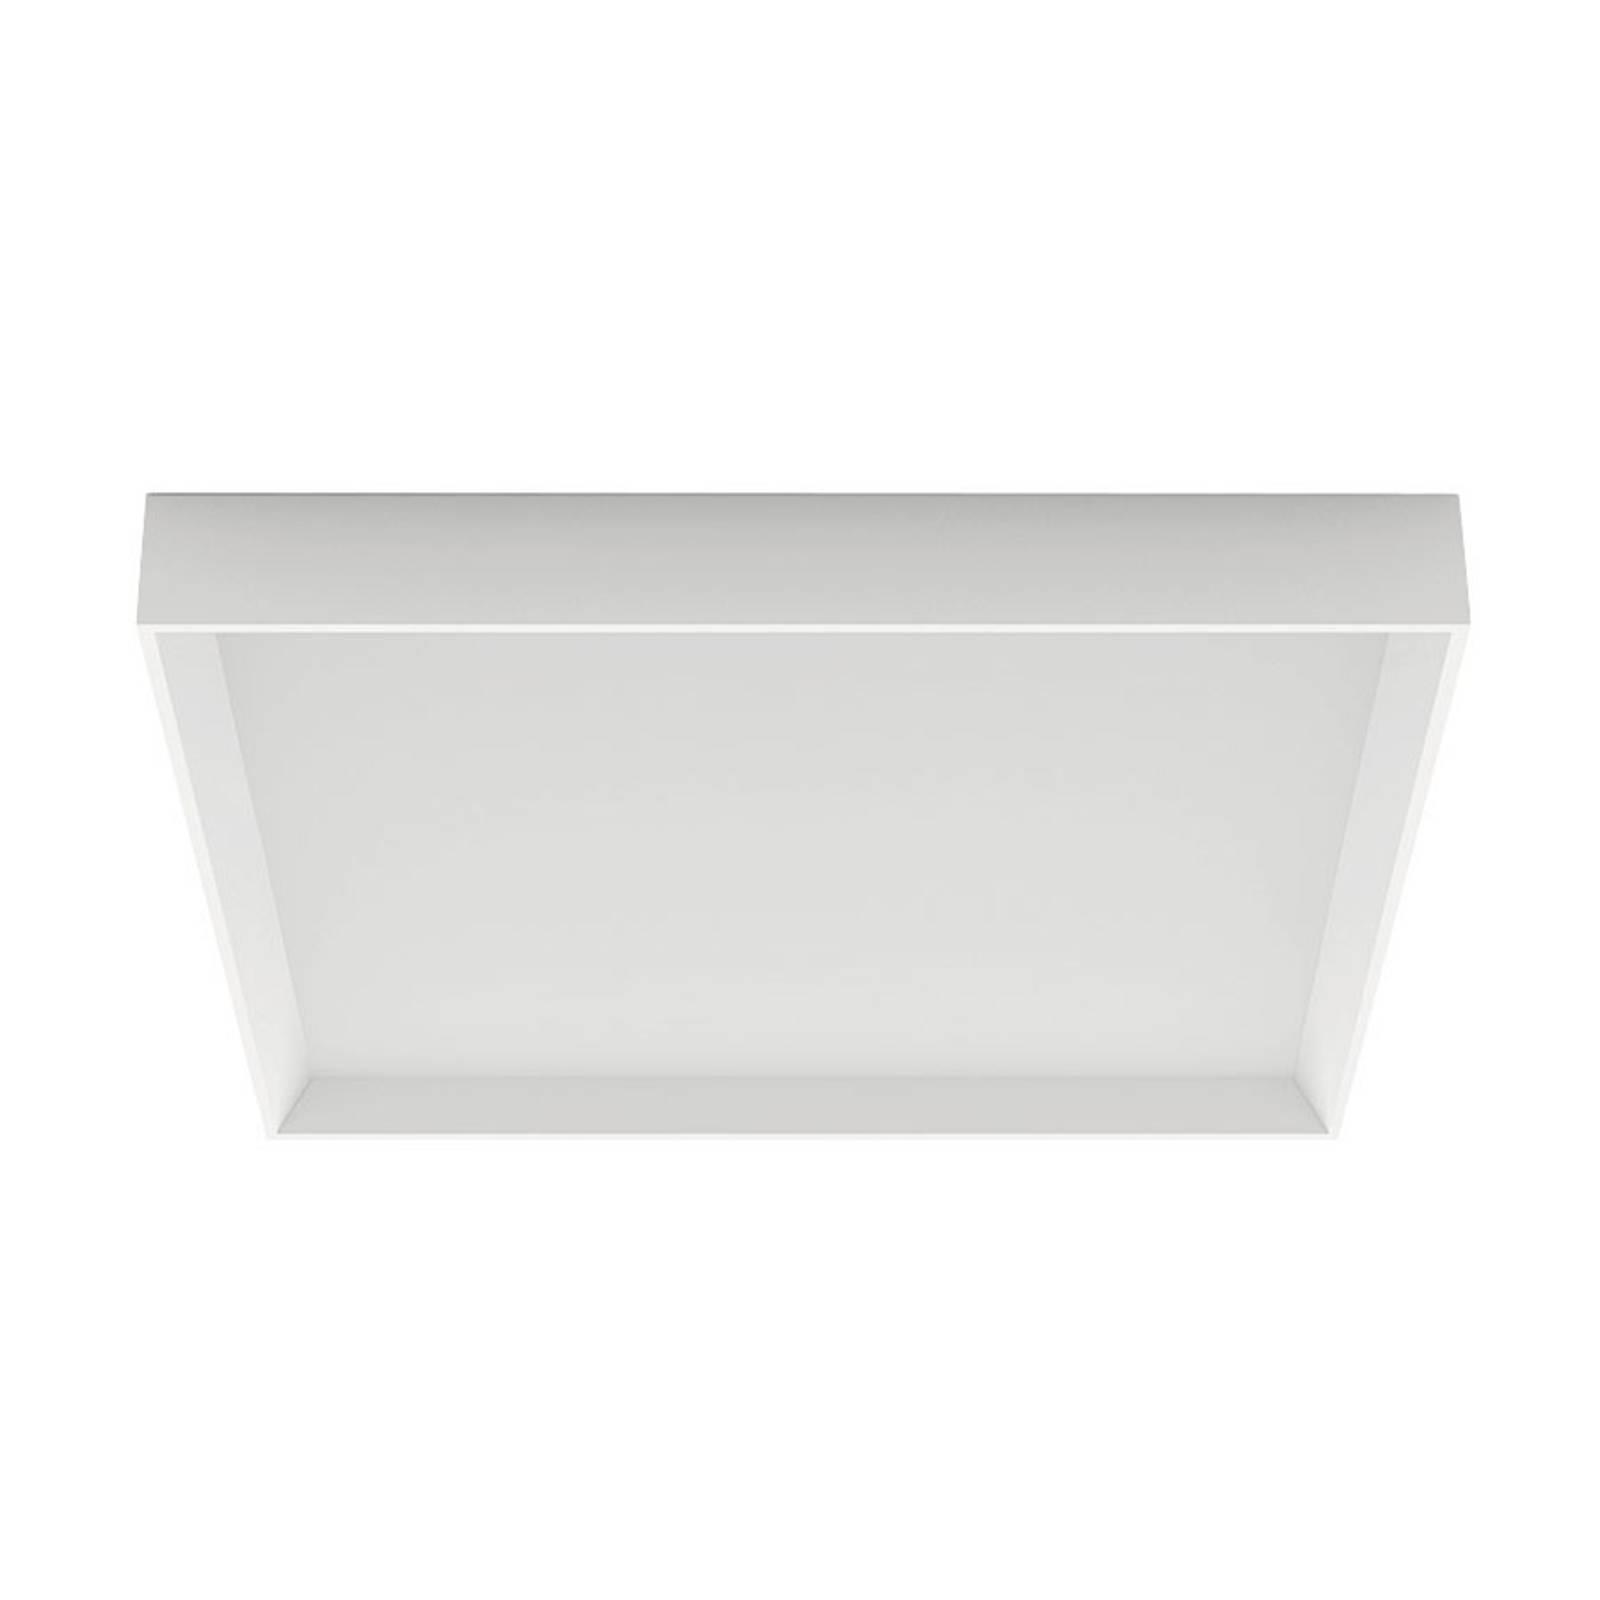 LED-Deckenleuchte Tara Q, eckig, 50 x 50 cm